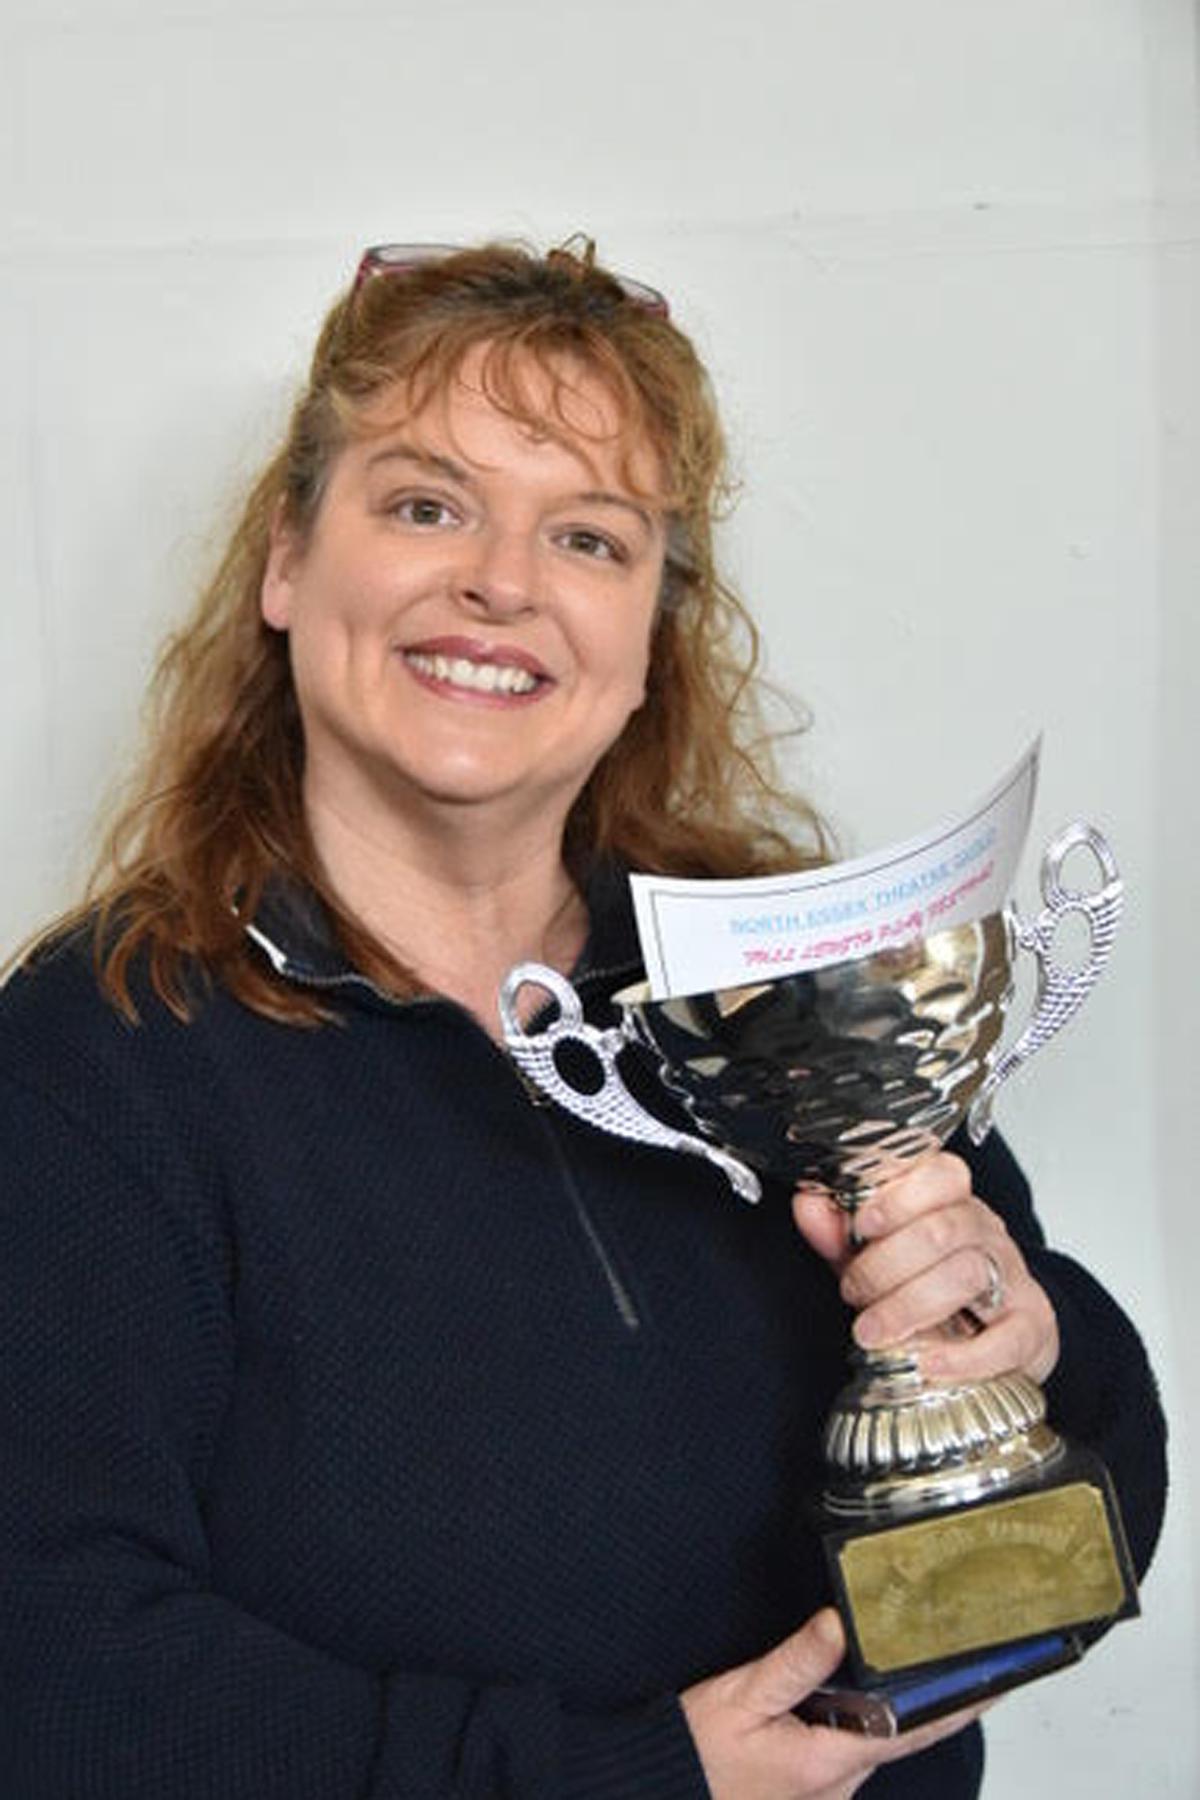 Claire trophy1